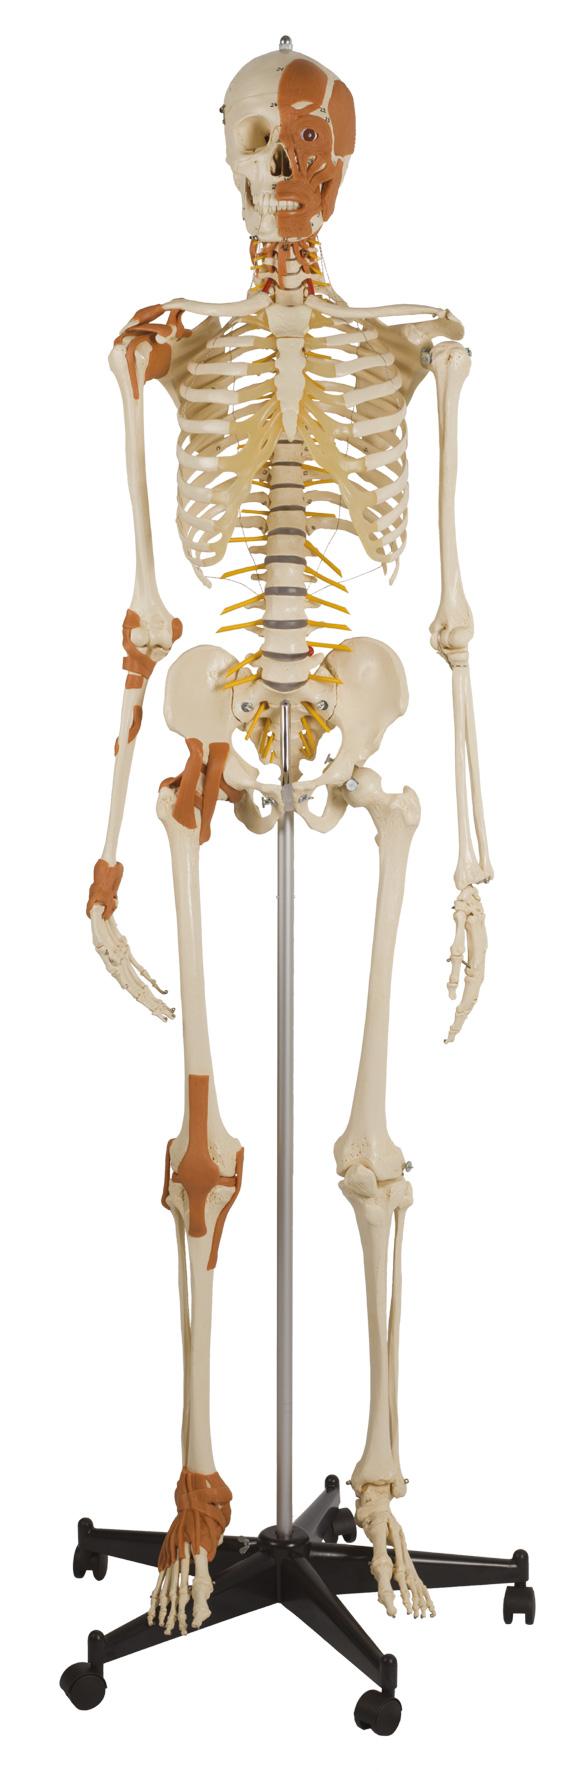 Flexibles Skelett m. Gelenkbändern   Fairplay Sporthandel